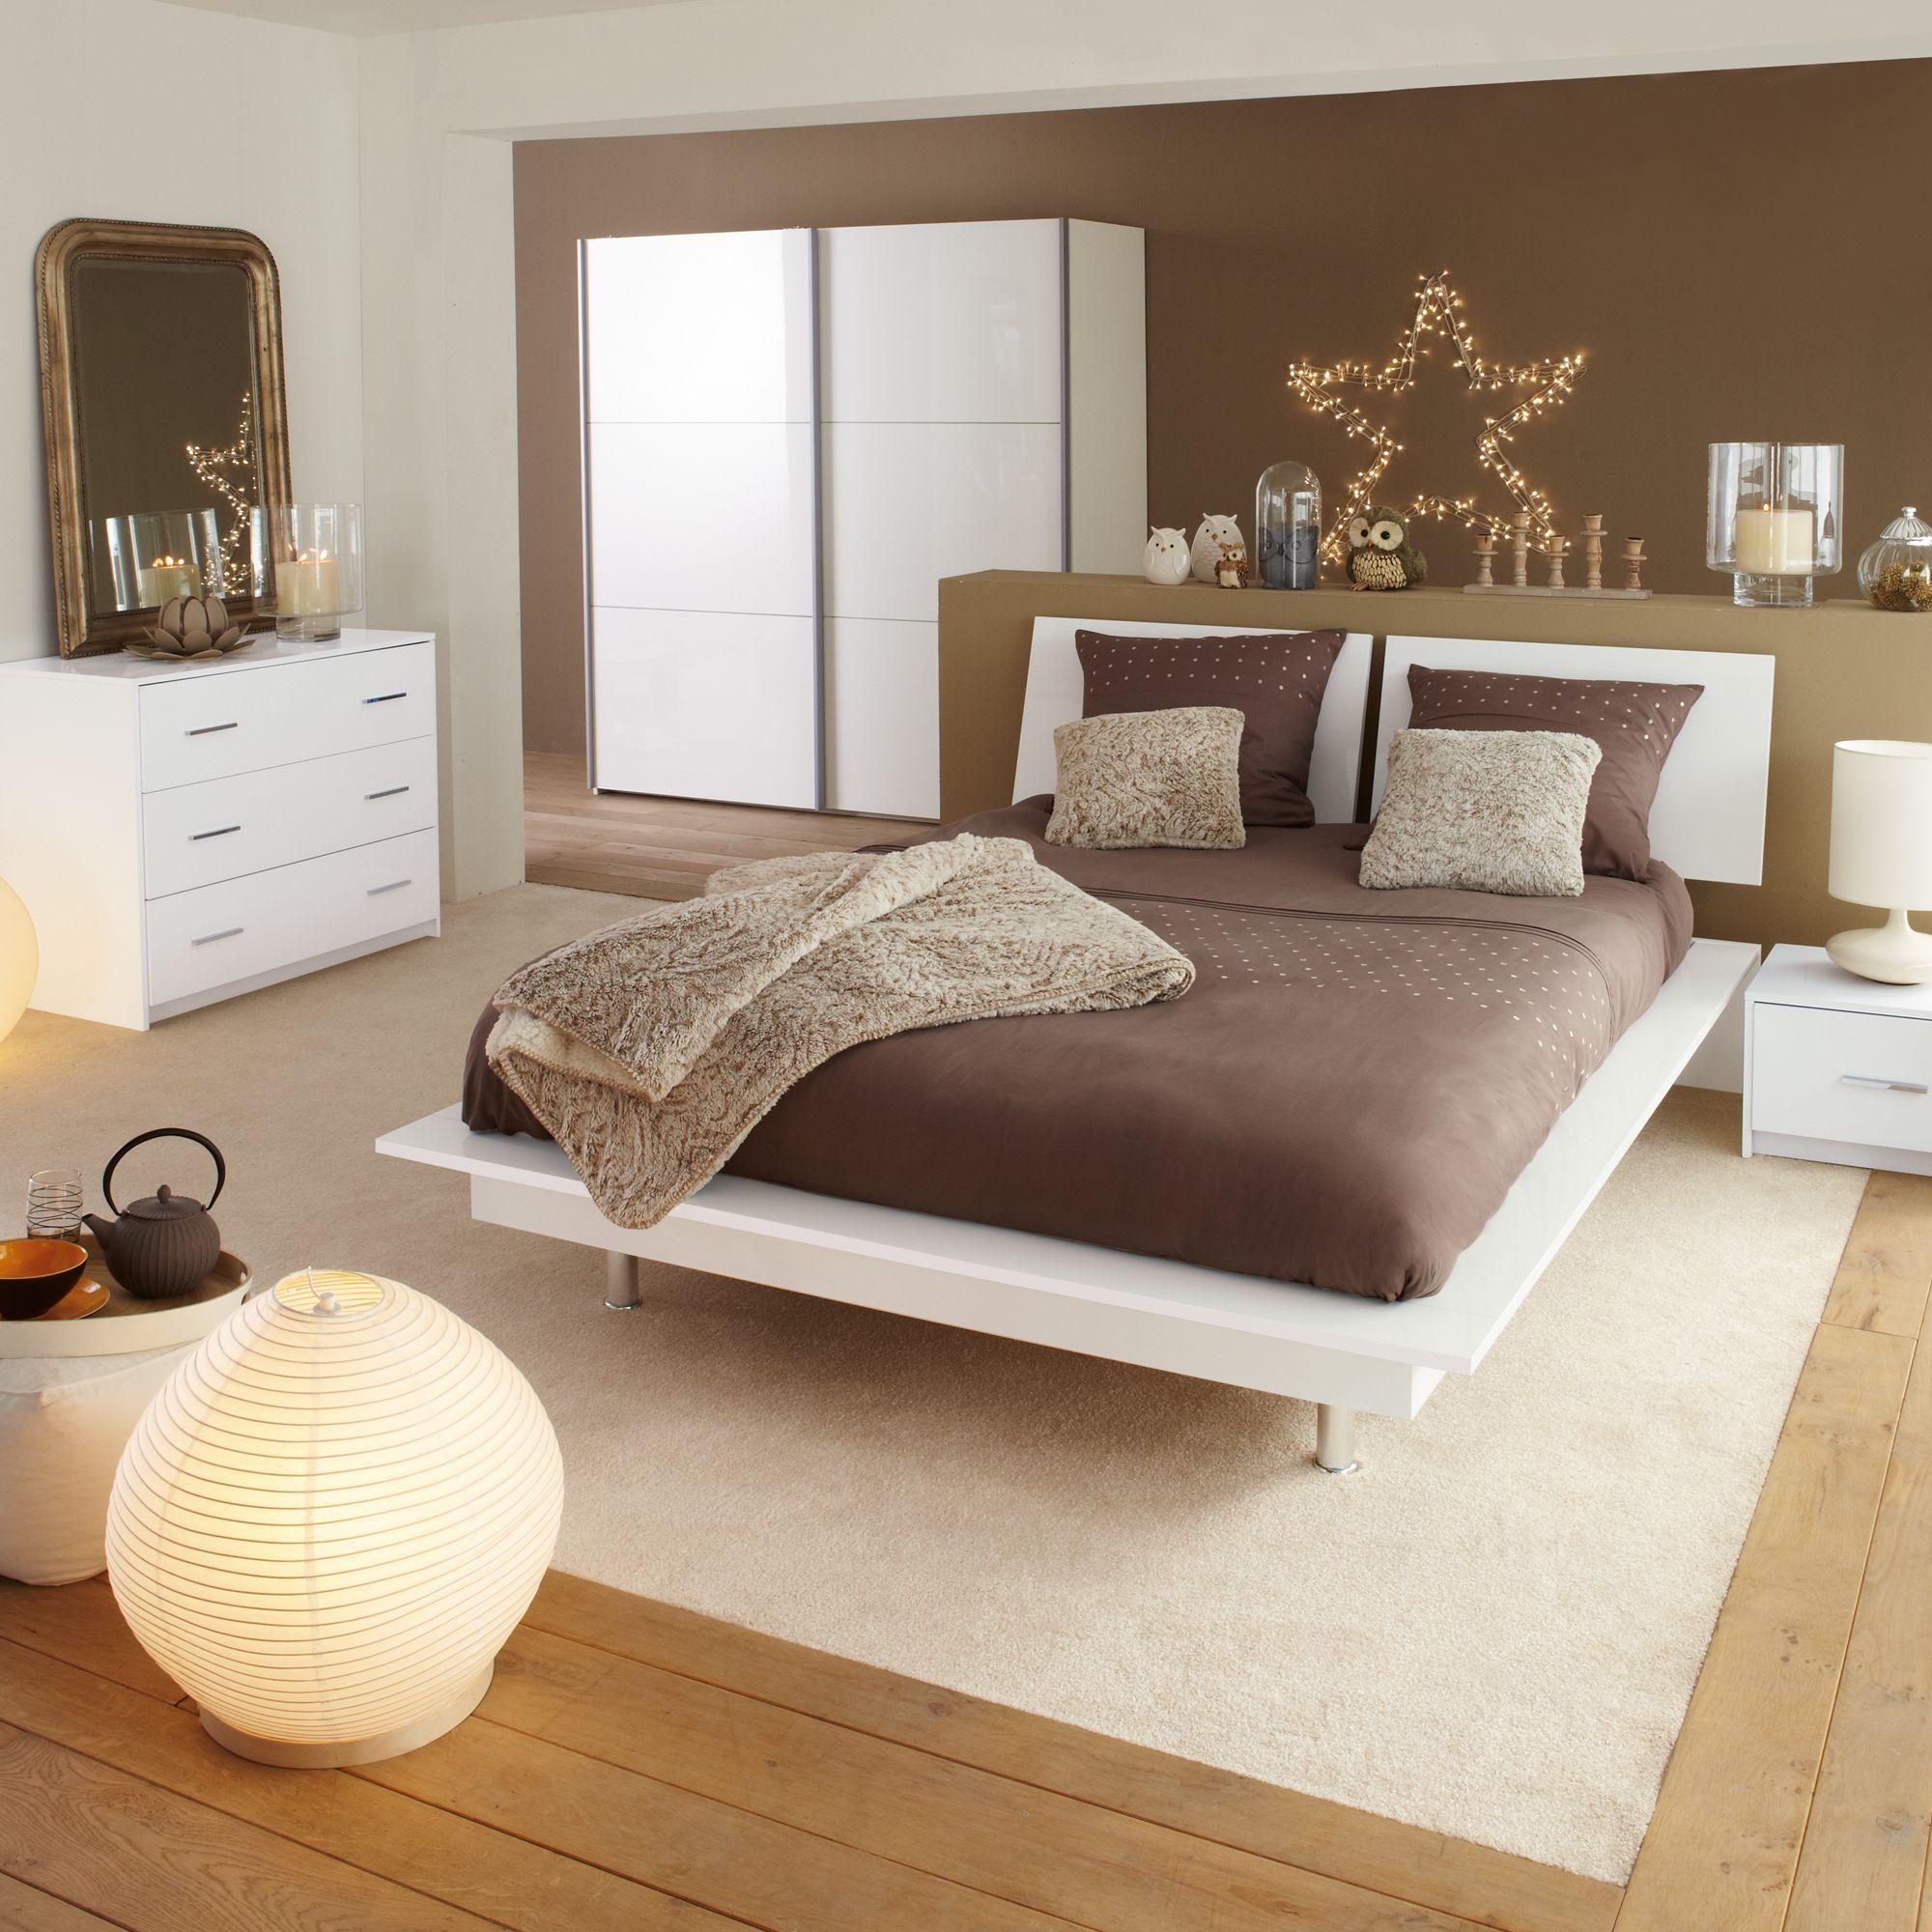 alinea lits adultes chambre complete adulte alinea beautiful stunning armoire. Black Bedroom Furniture Sets. Home Design Ideas